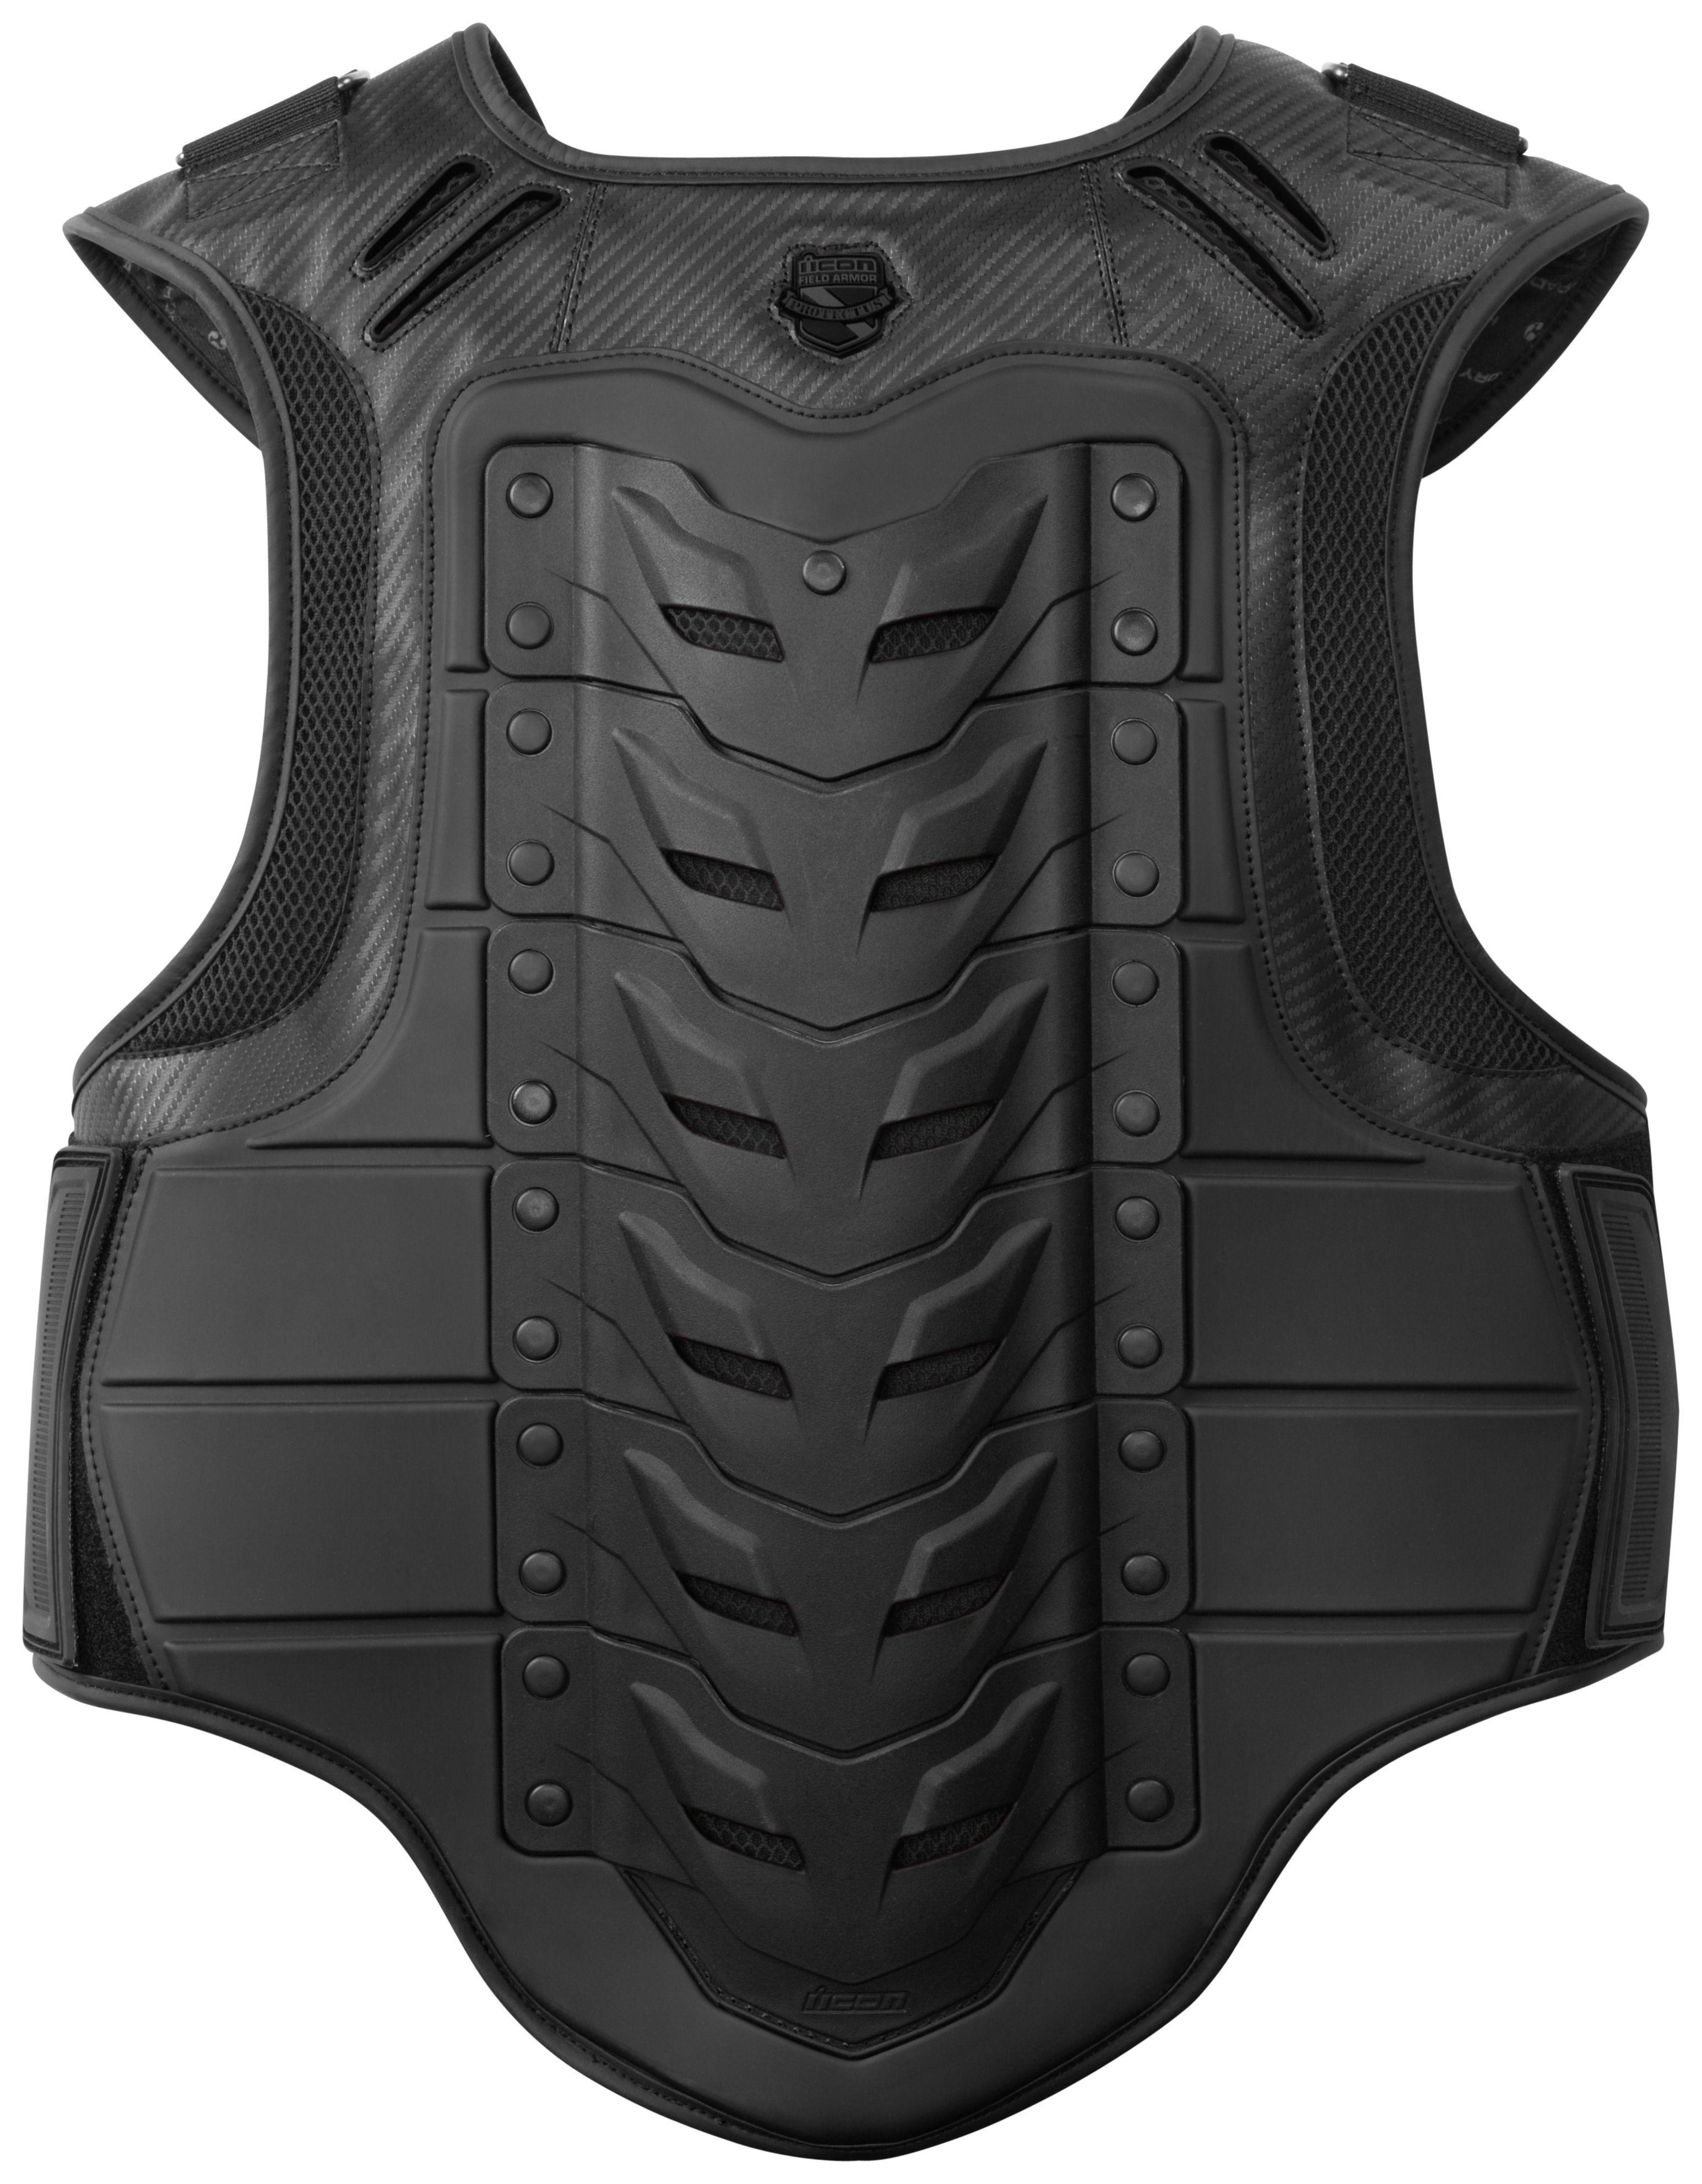 Icon Stryker Women's Vest Womens vest, Motorcycle vest, Vest